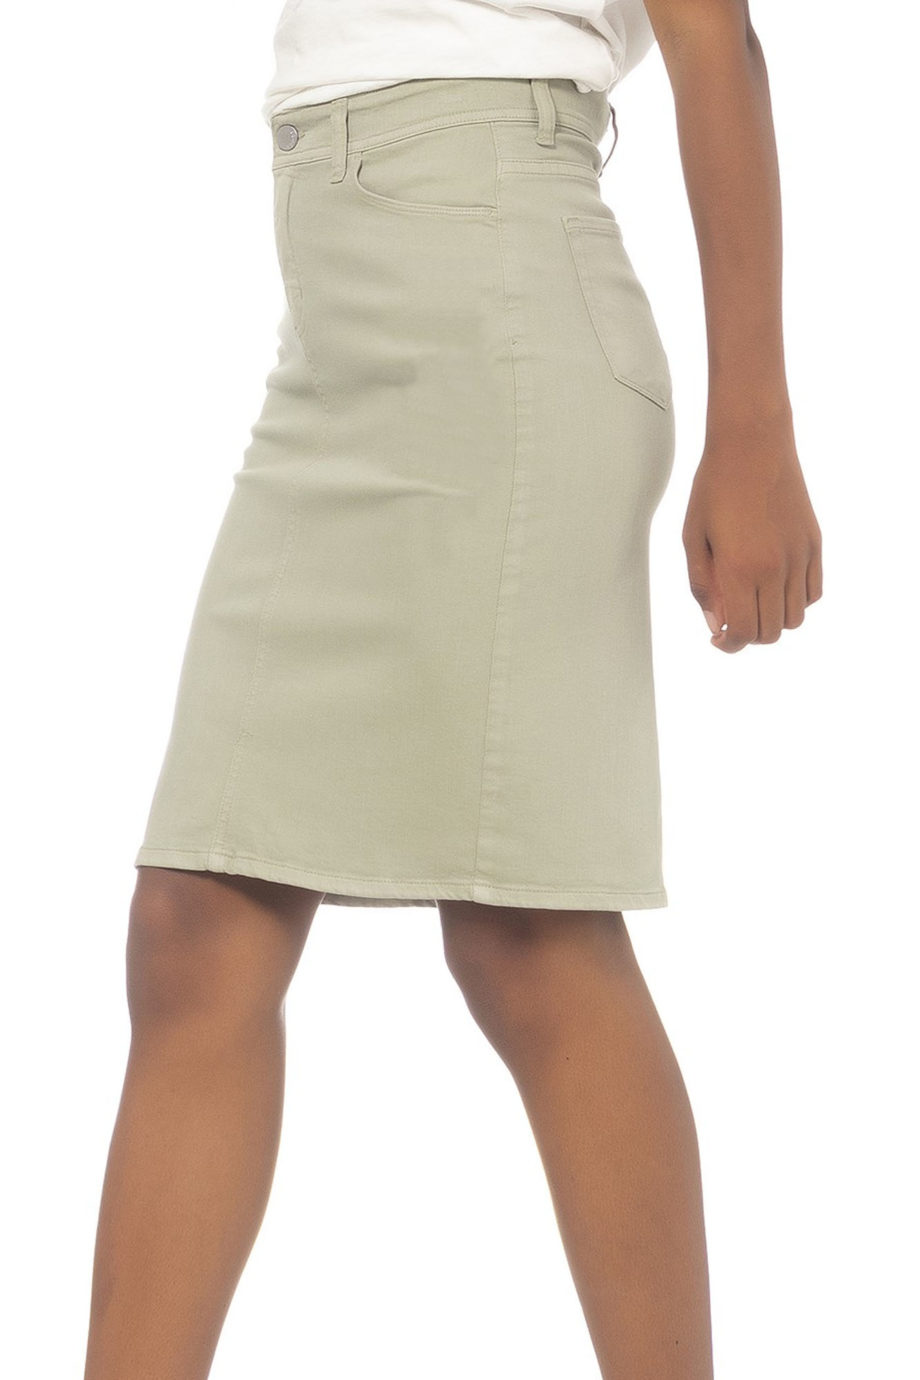 cowest-falda-pol-kaki